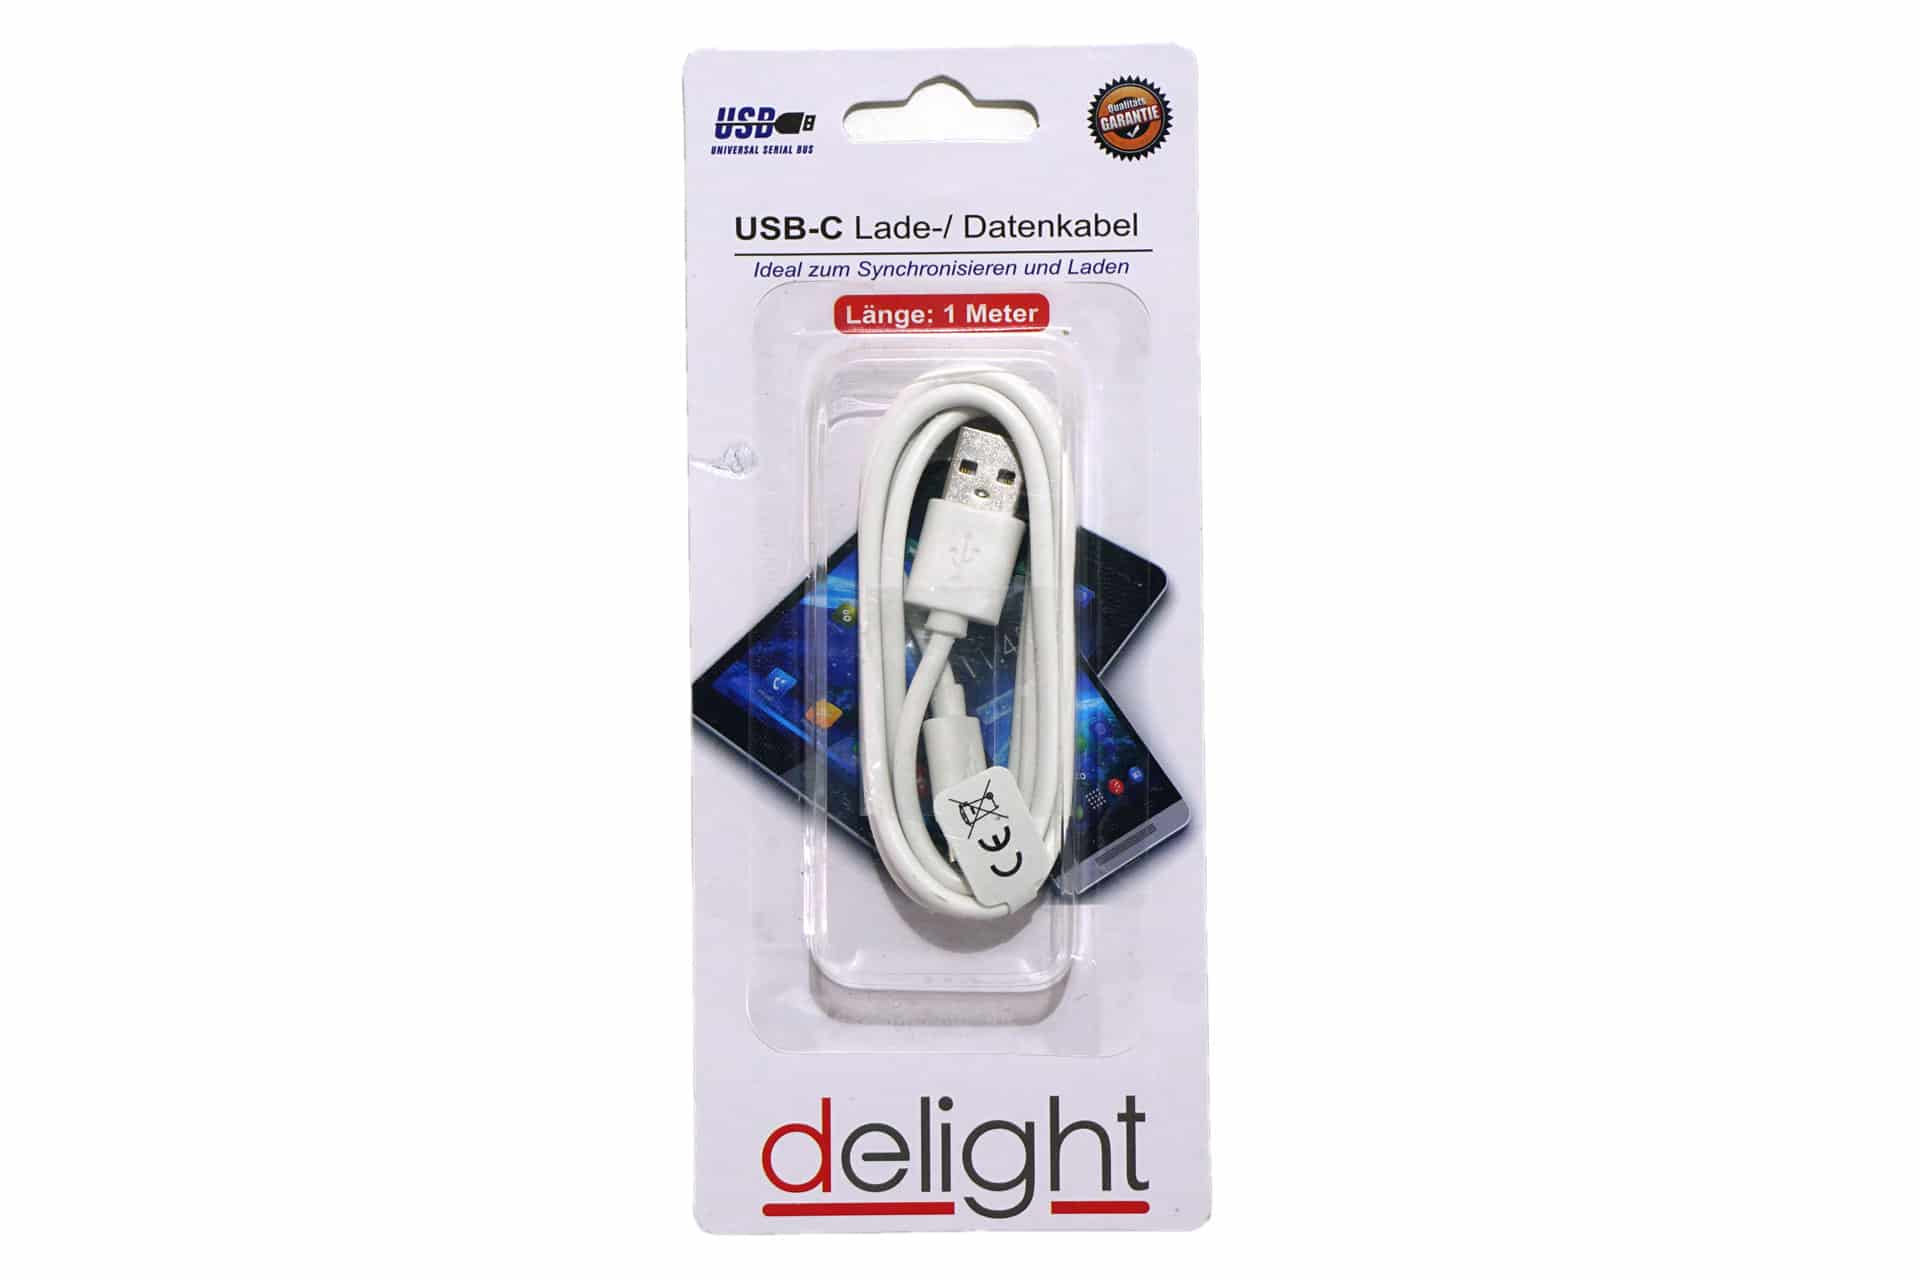 Lade-/Datenkabel - USB-C